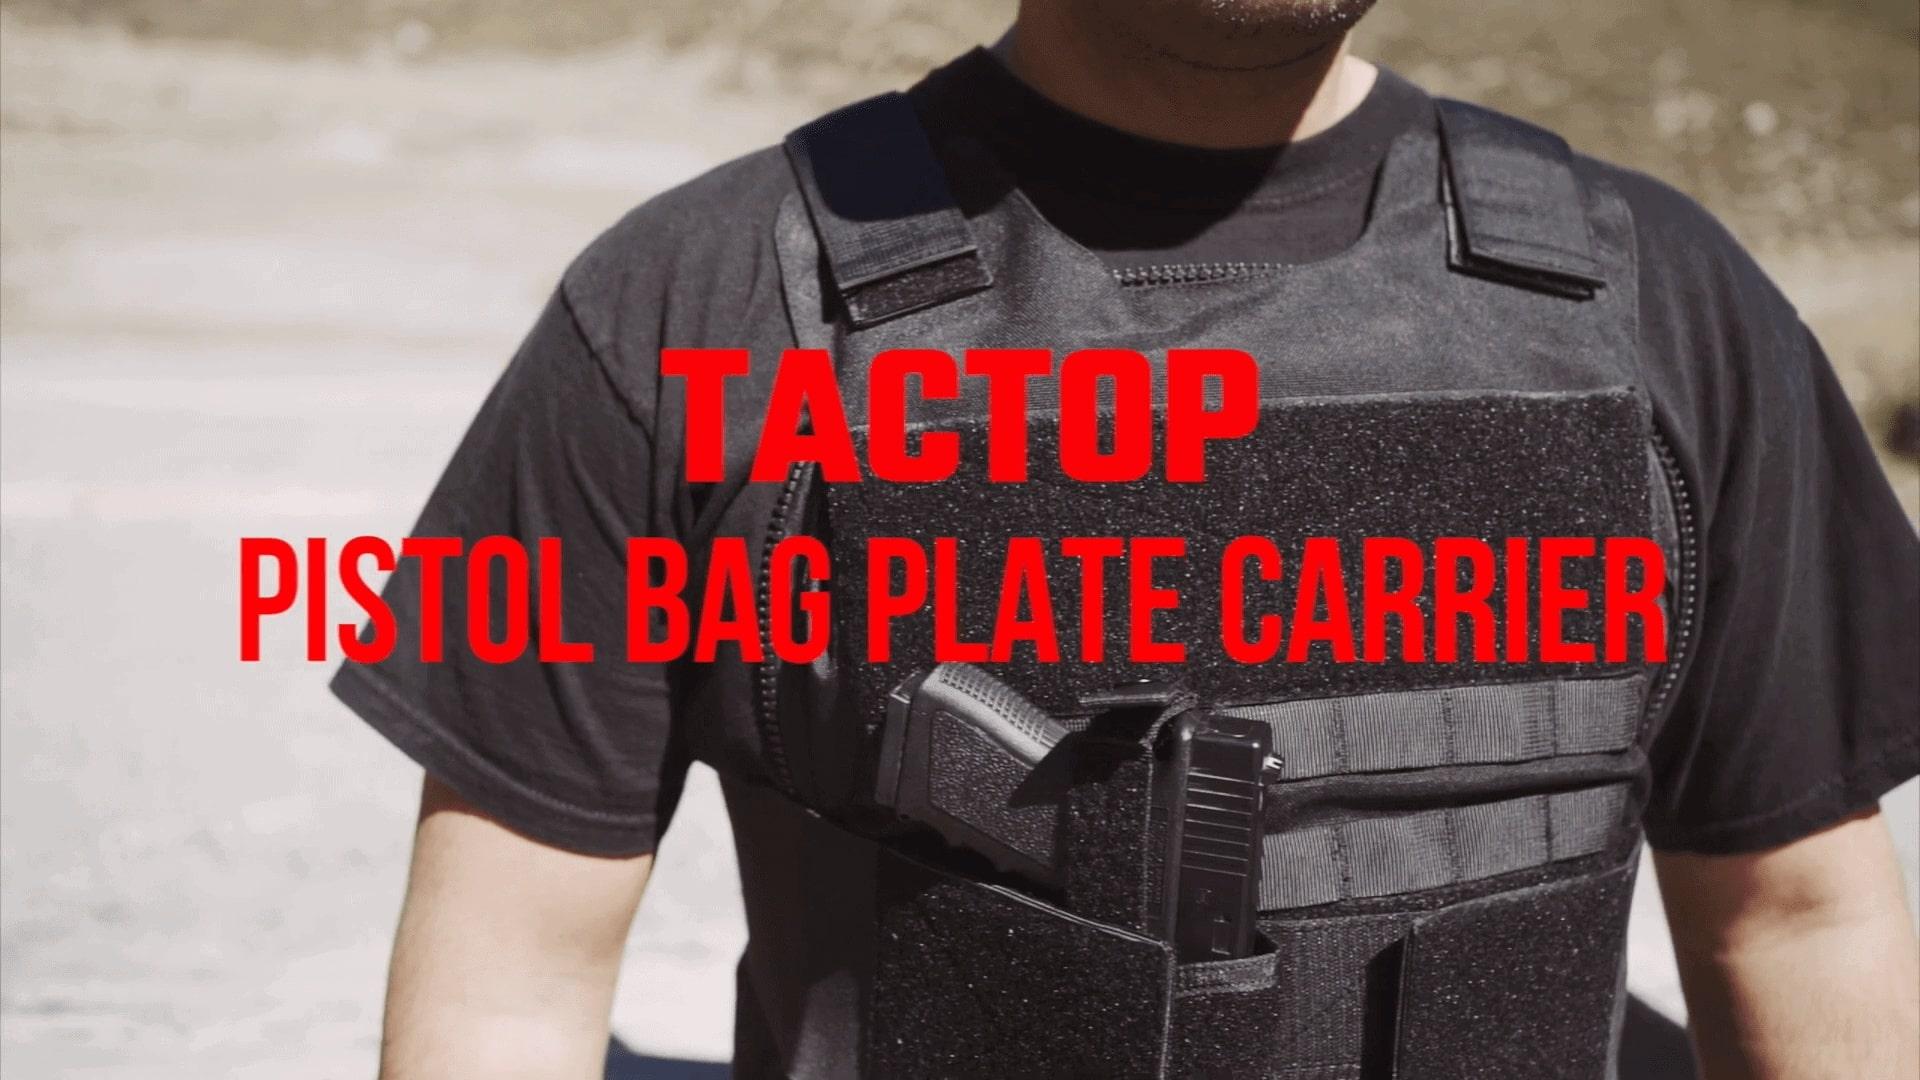 Tactop Convertable Plate Carrier Pistol Bag